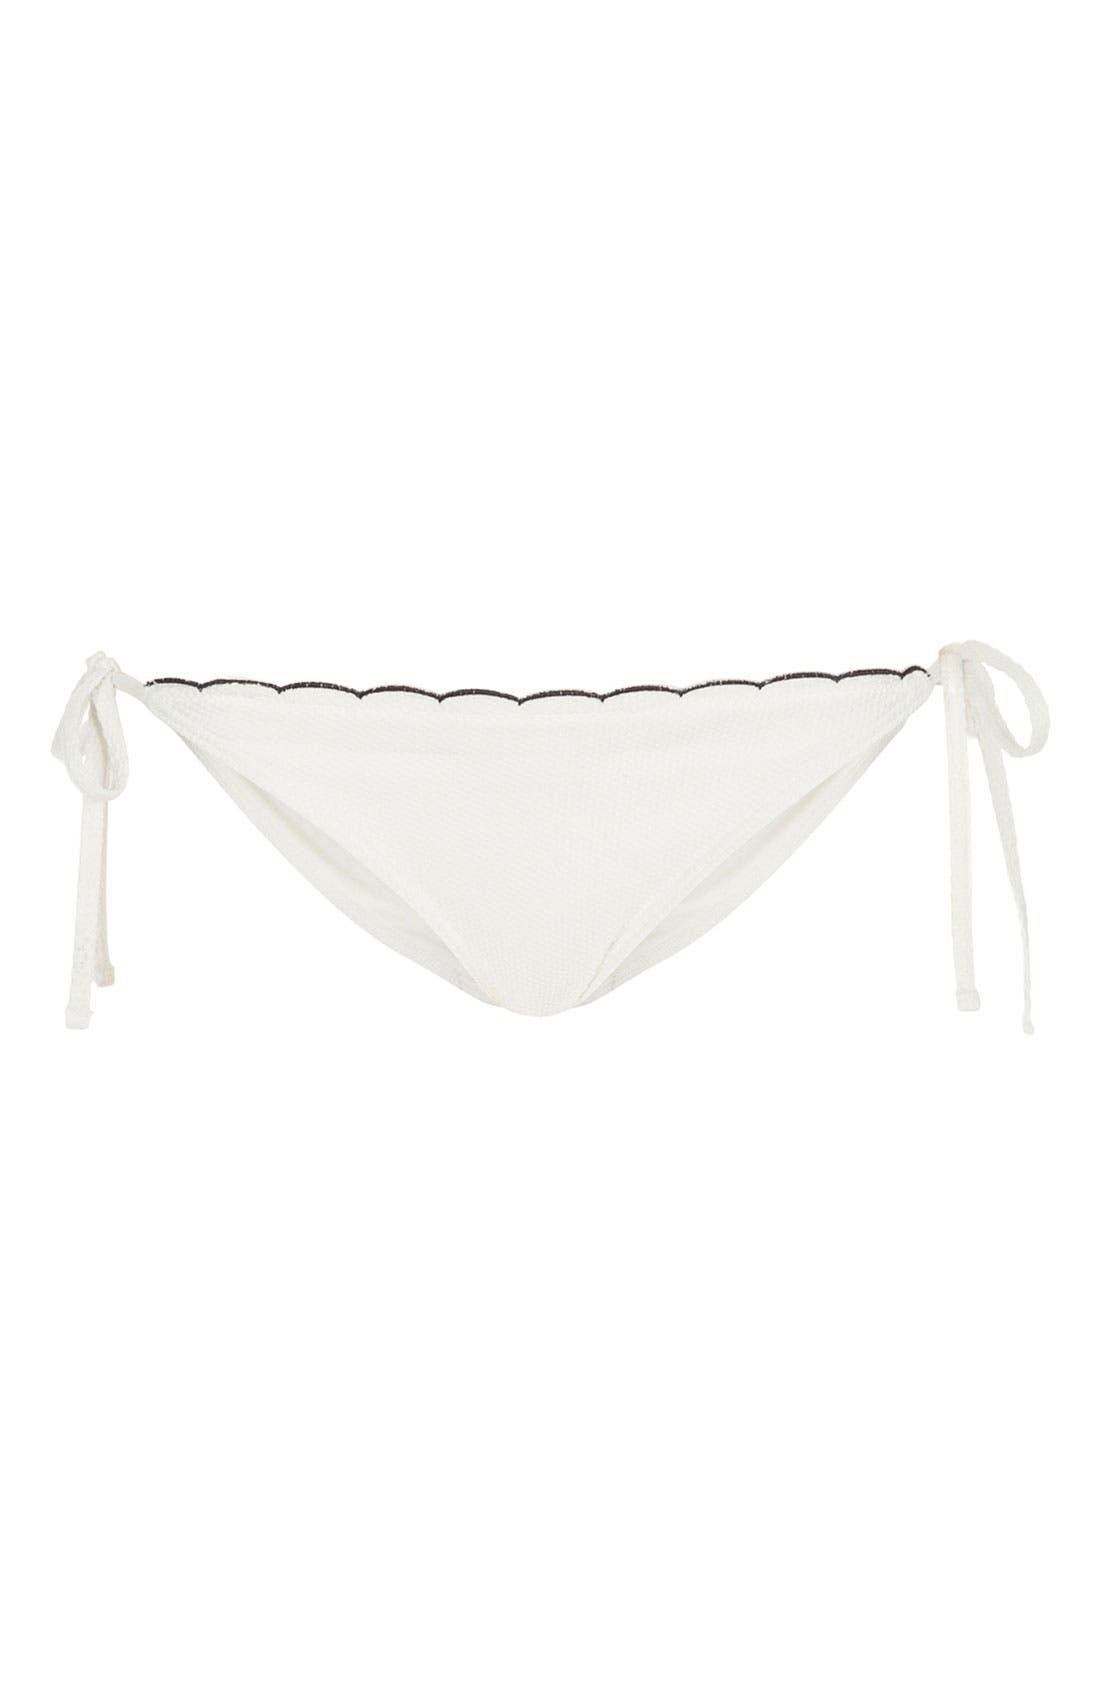 Main Image - Topshop Scallop Side Tie Bikini Bottoms